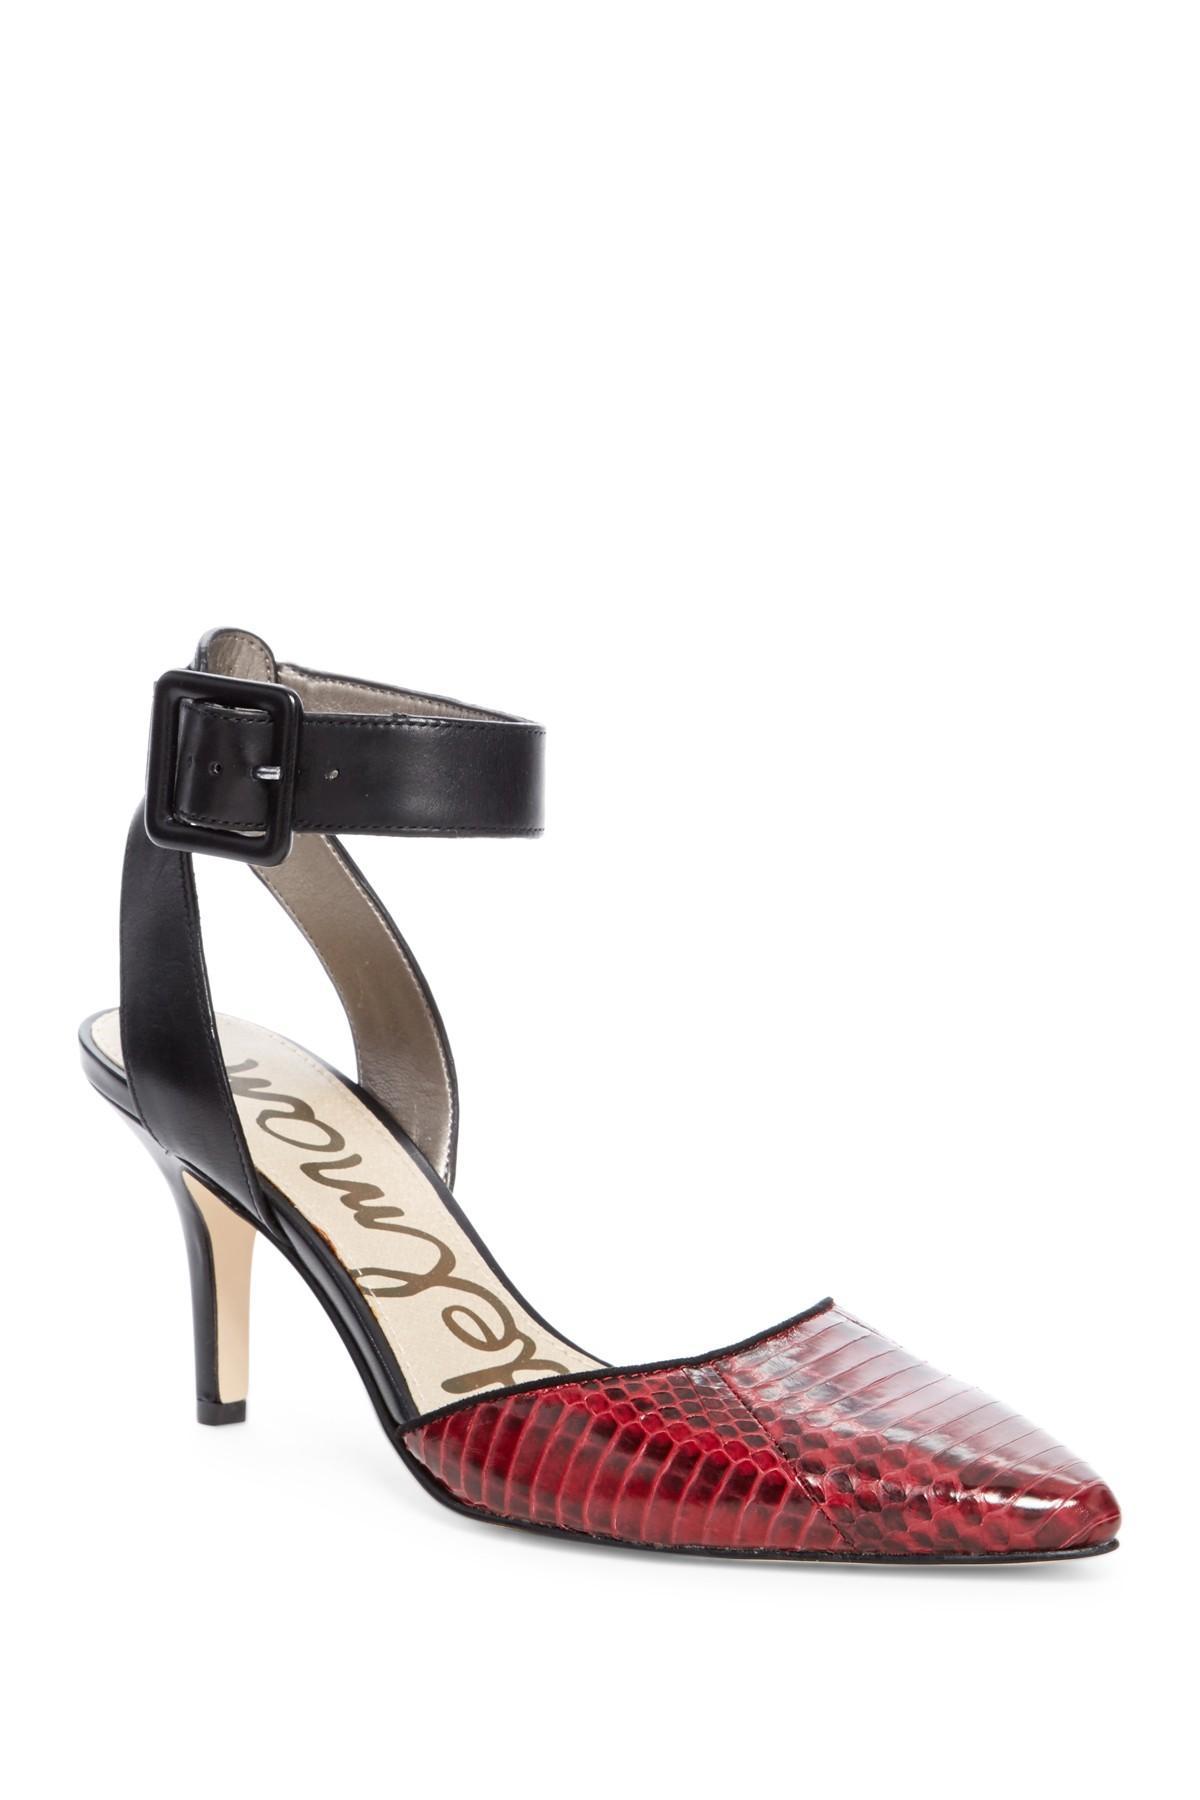 Sam Edelman Okala Ankle Strap Embossed Leather Pump In